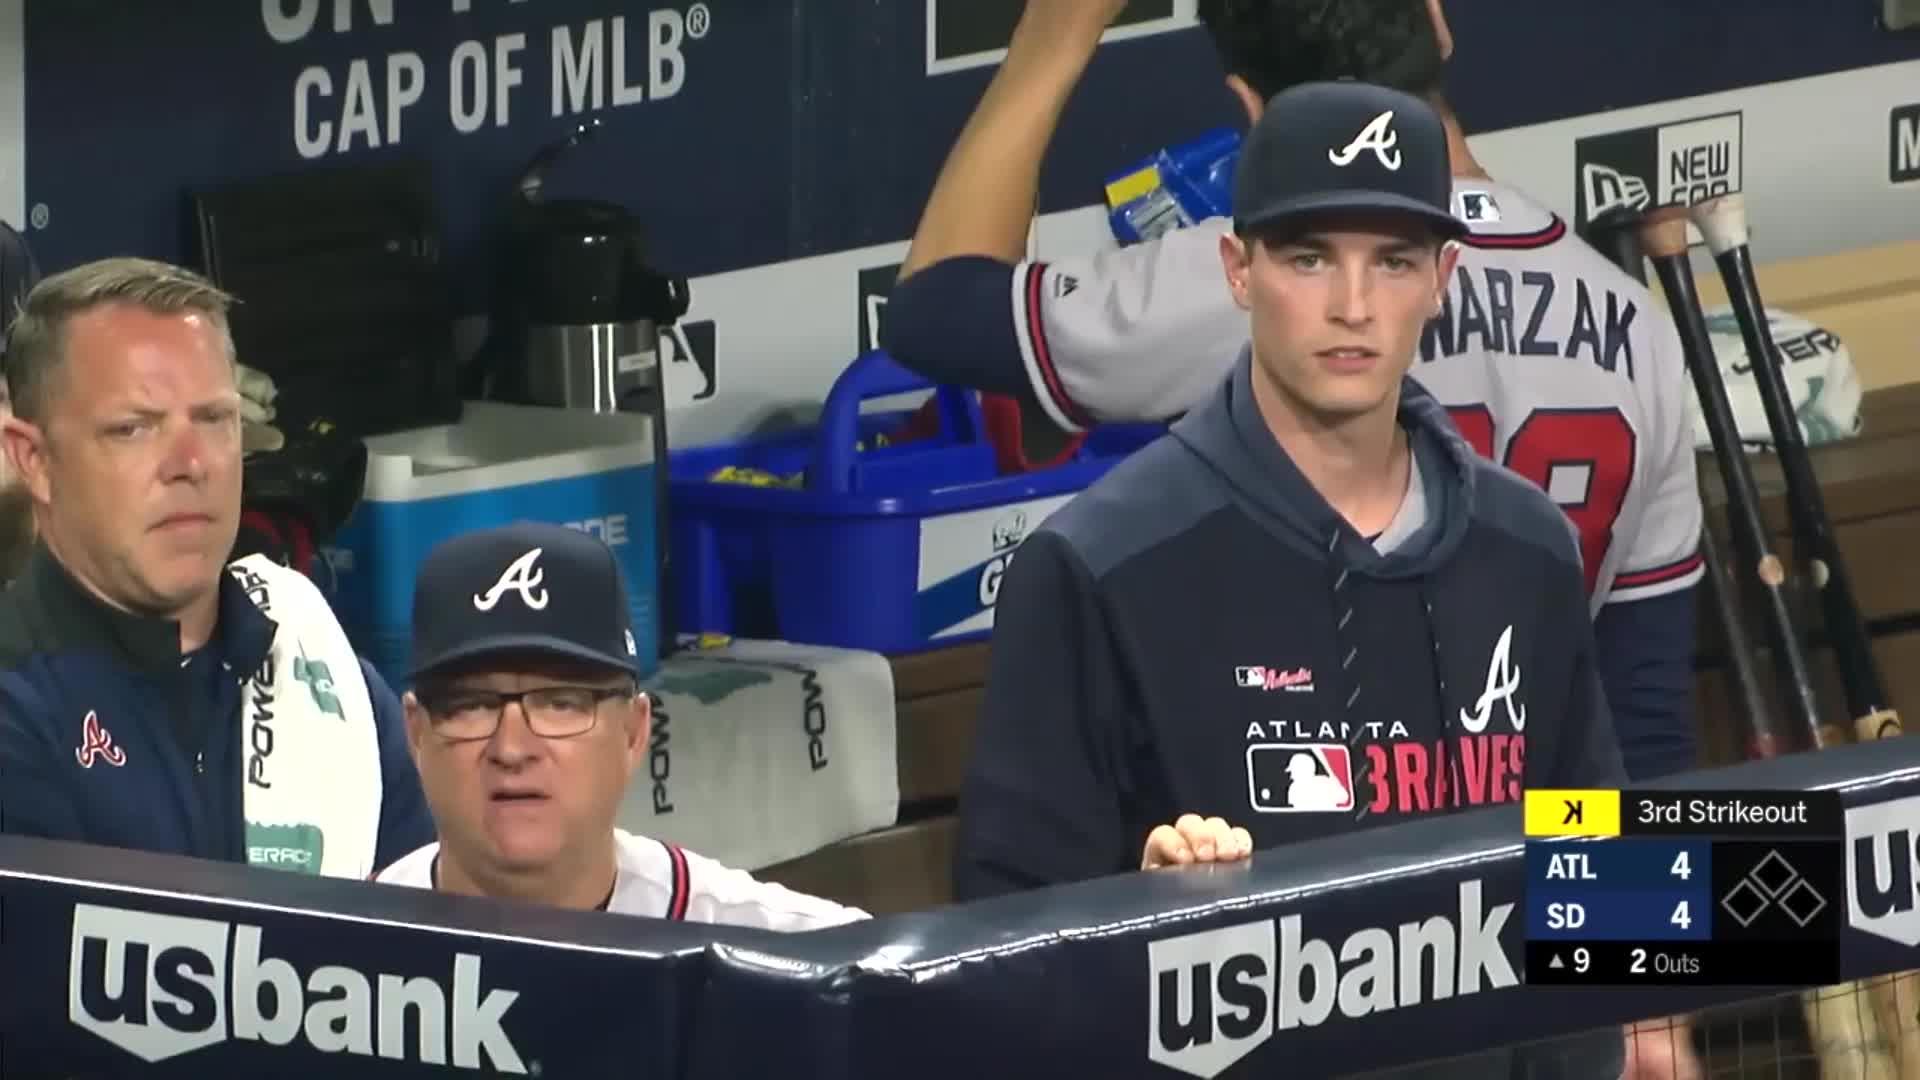 atlanta, atlanta braves, baseball, braves, Max Fried and Kevin Seitzer complain about strike call. GIFs